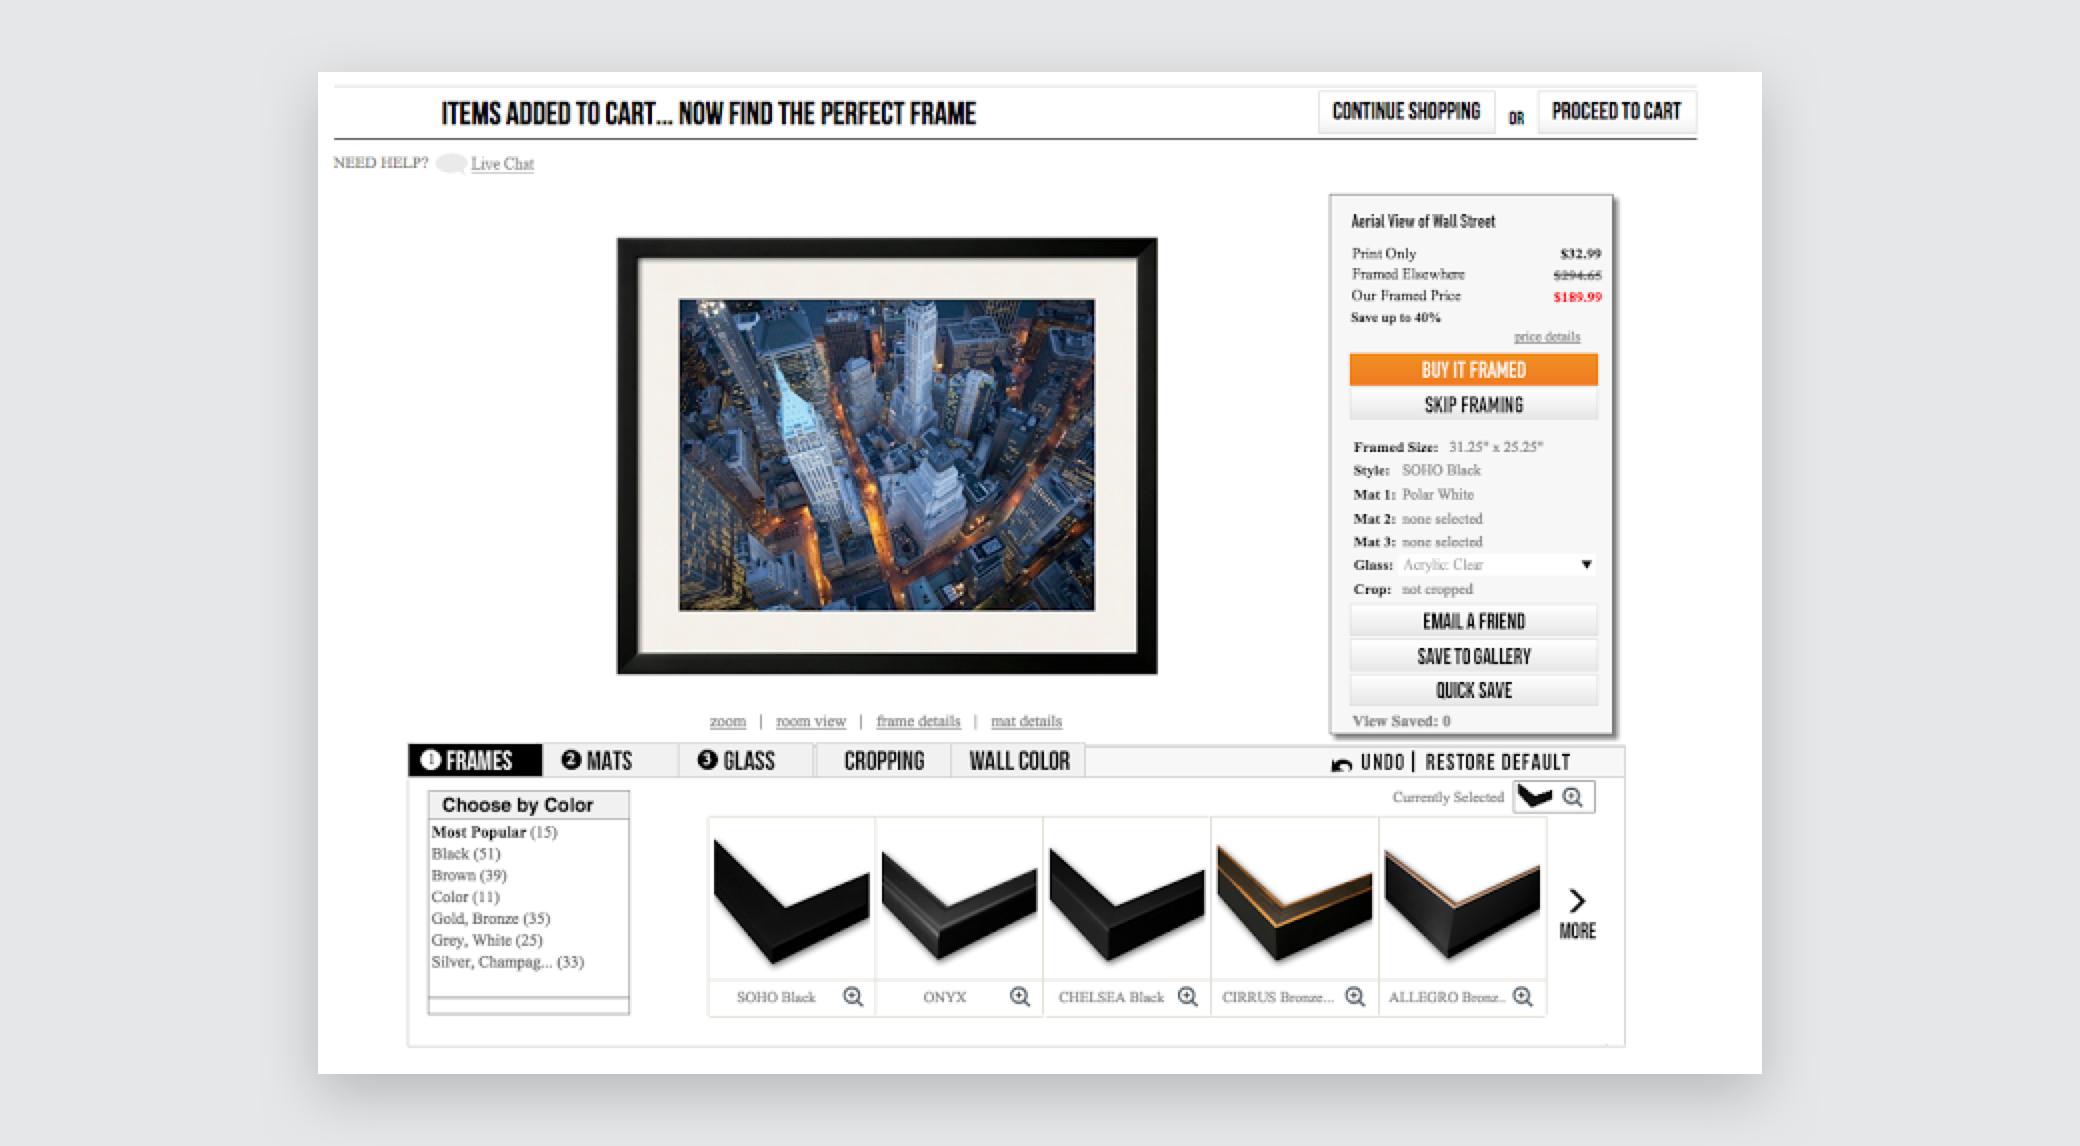 Art.com's cart